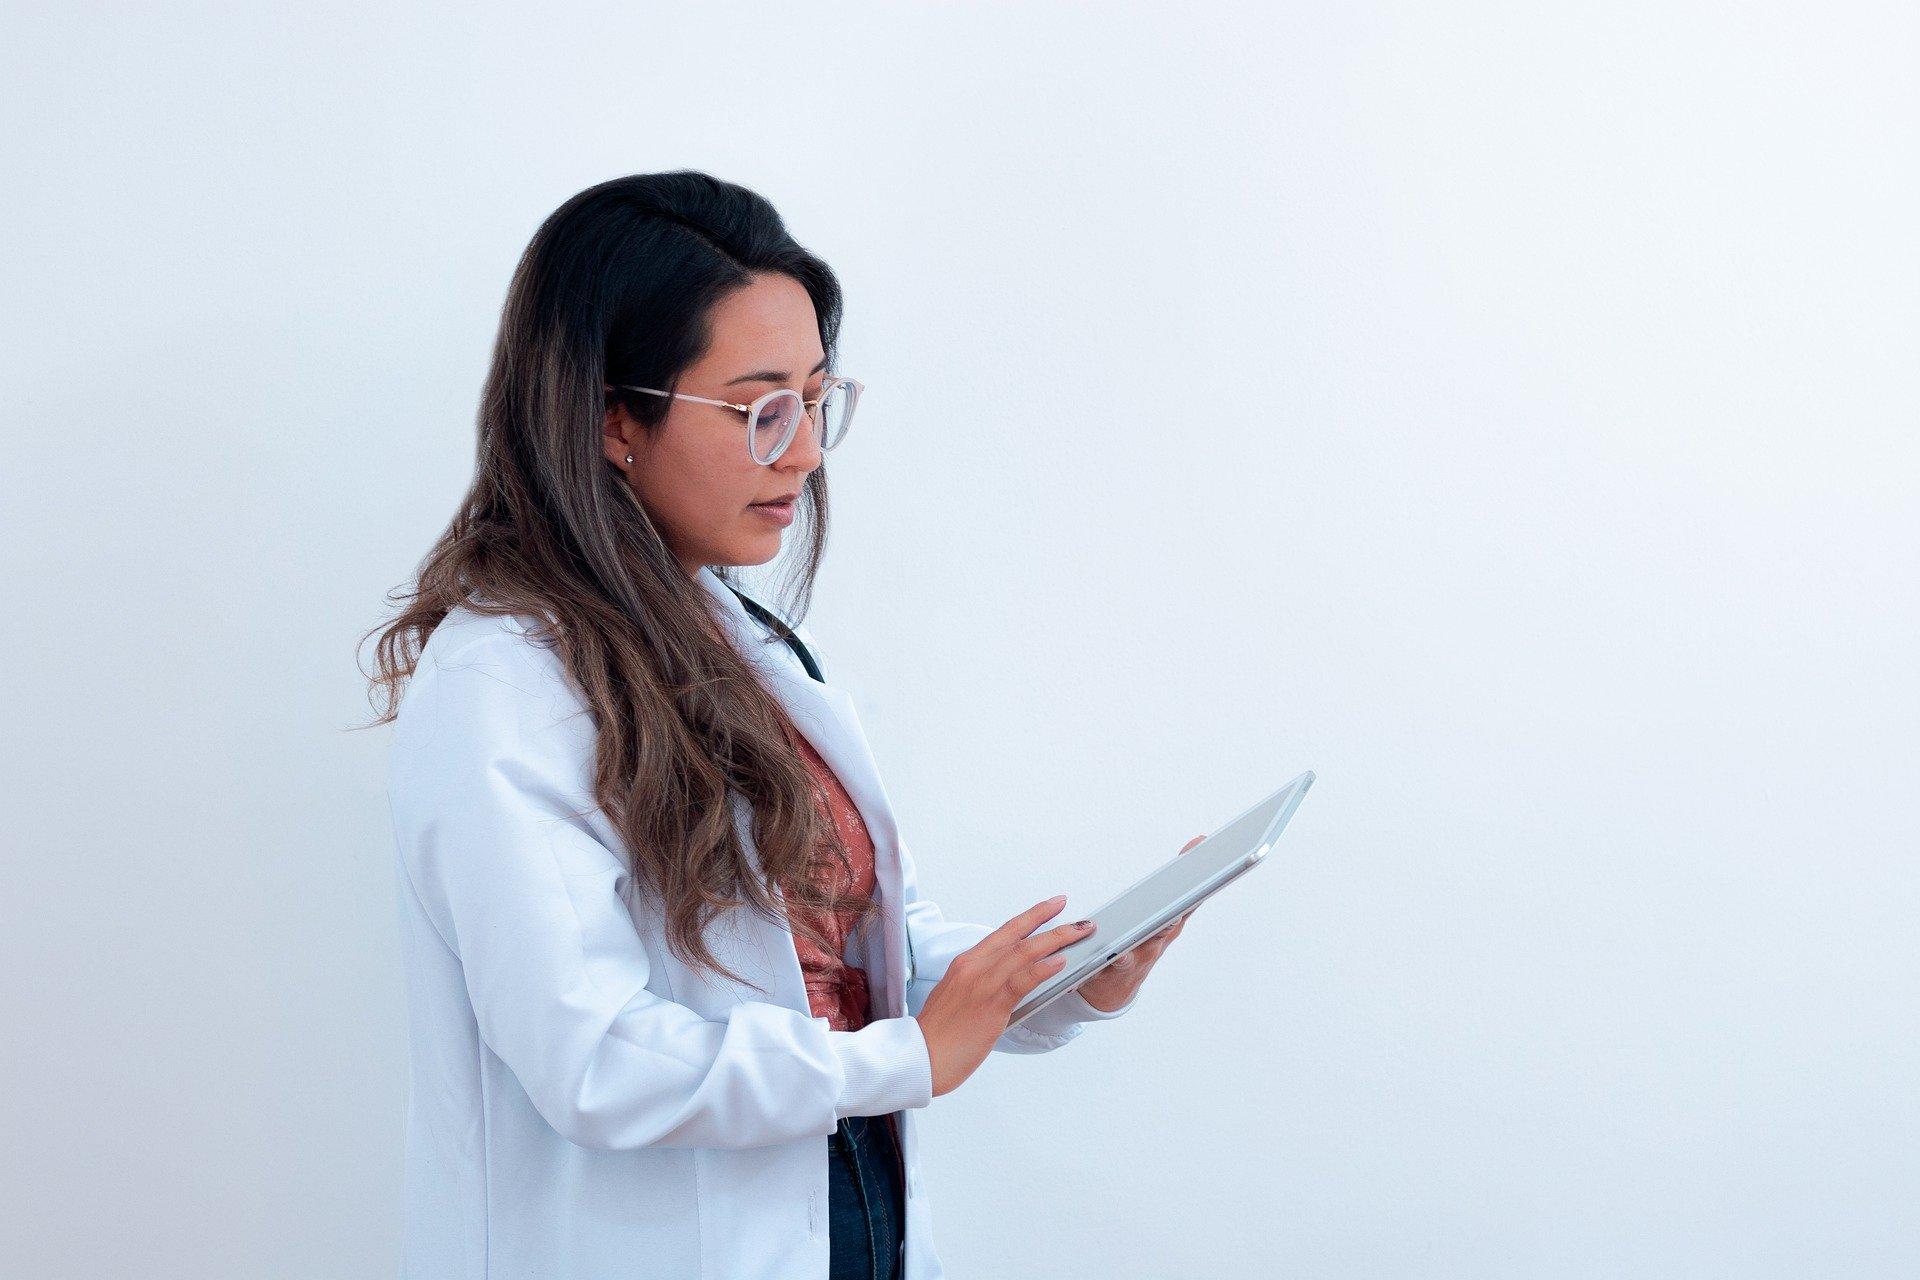 15 Nursing Career Paths to Consider